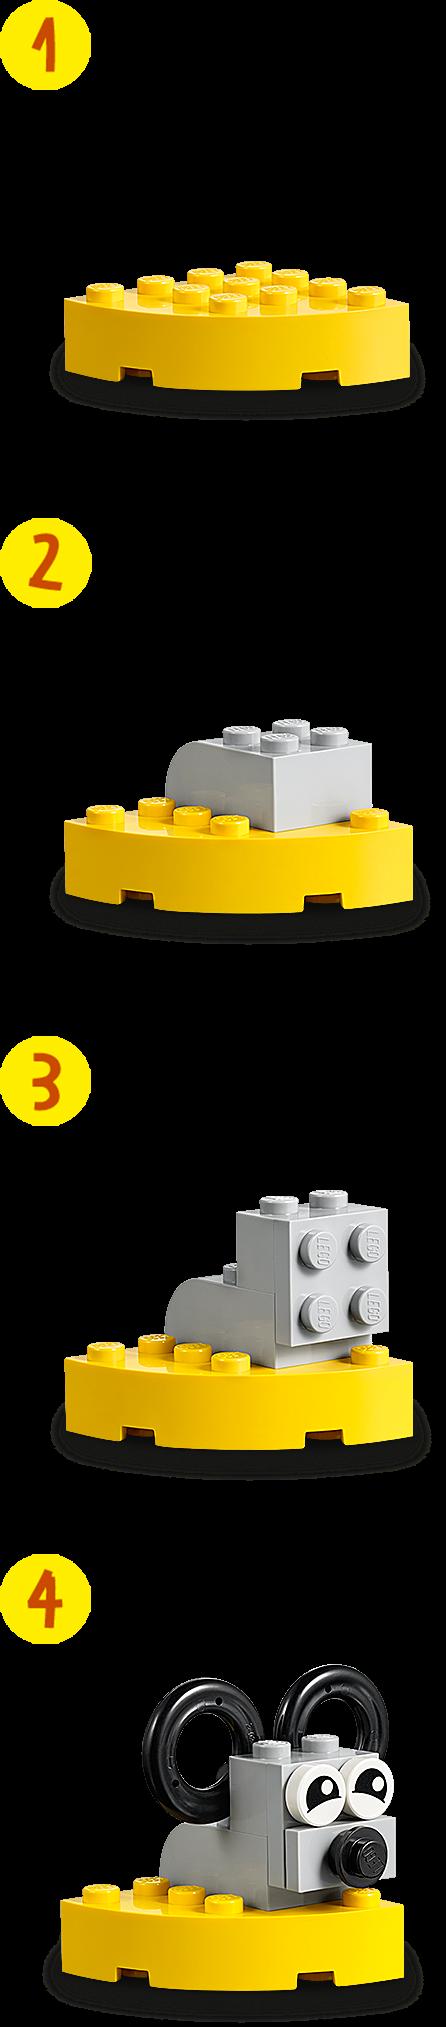 Creative Building Bricks